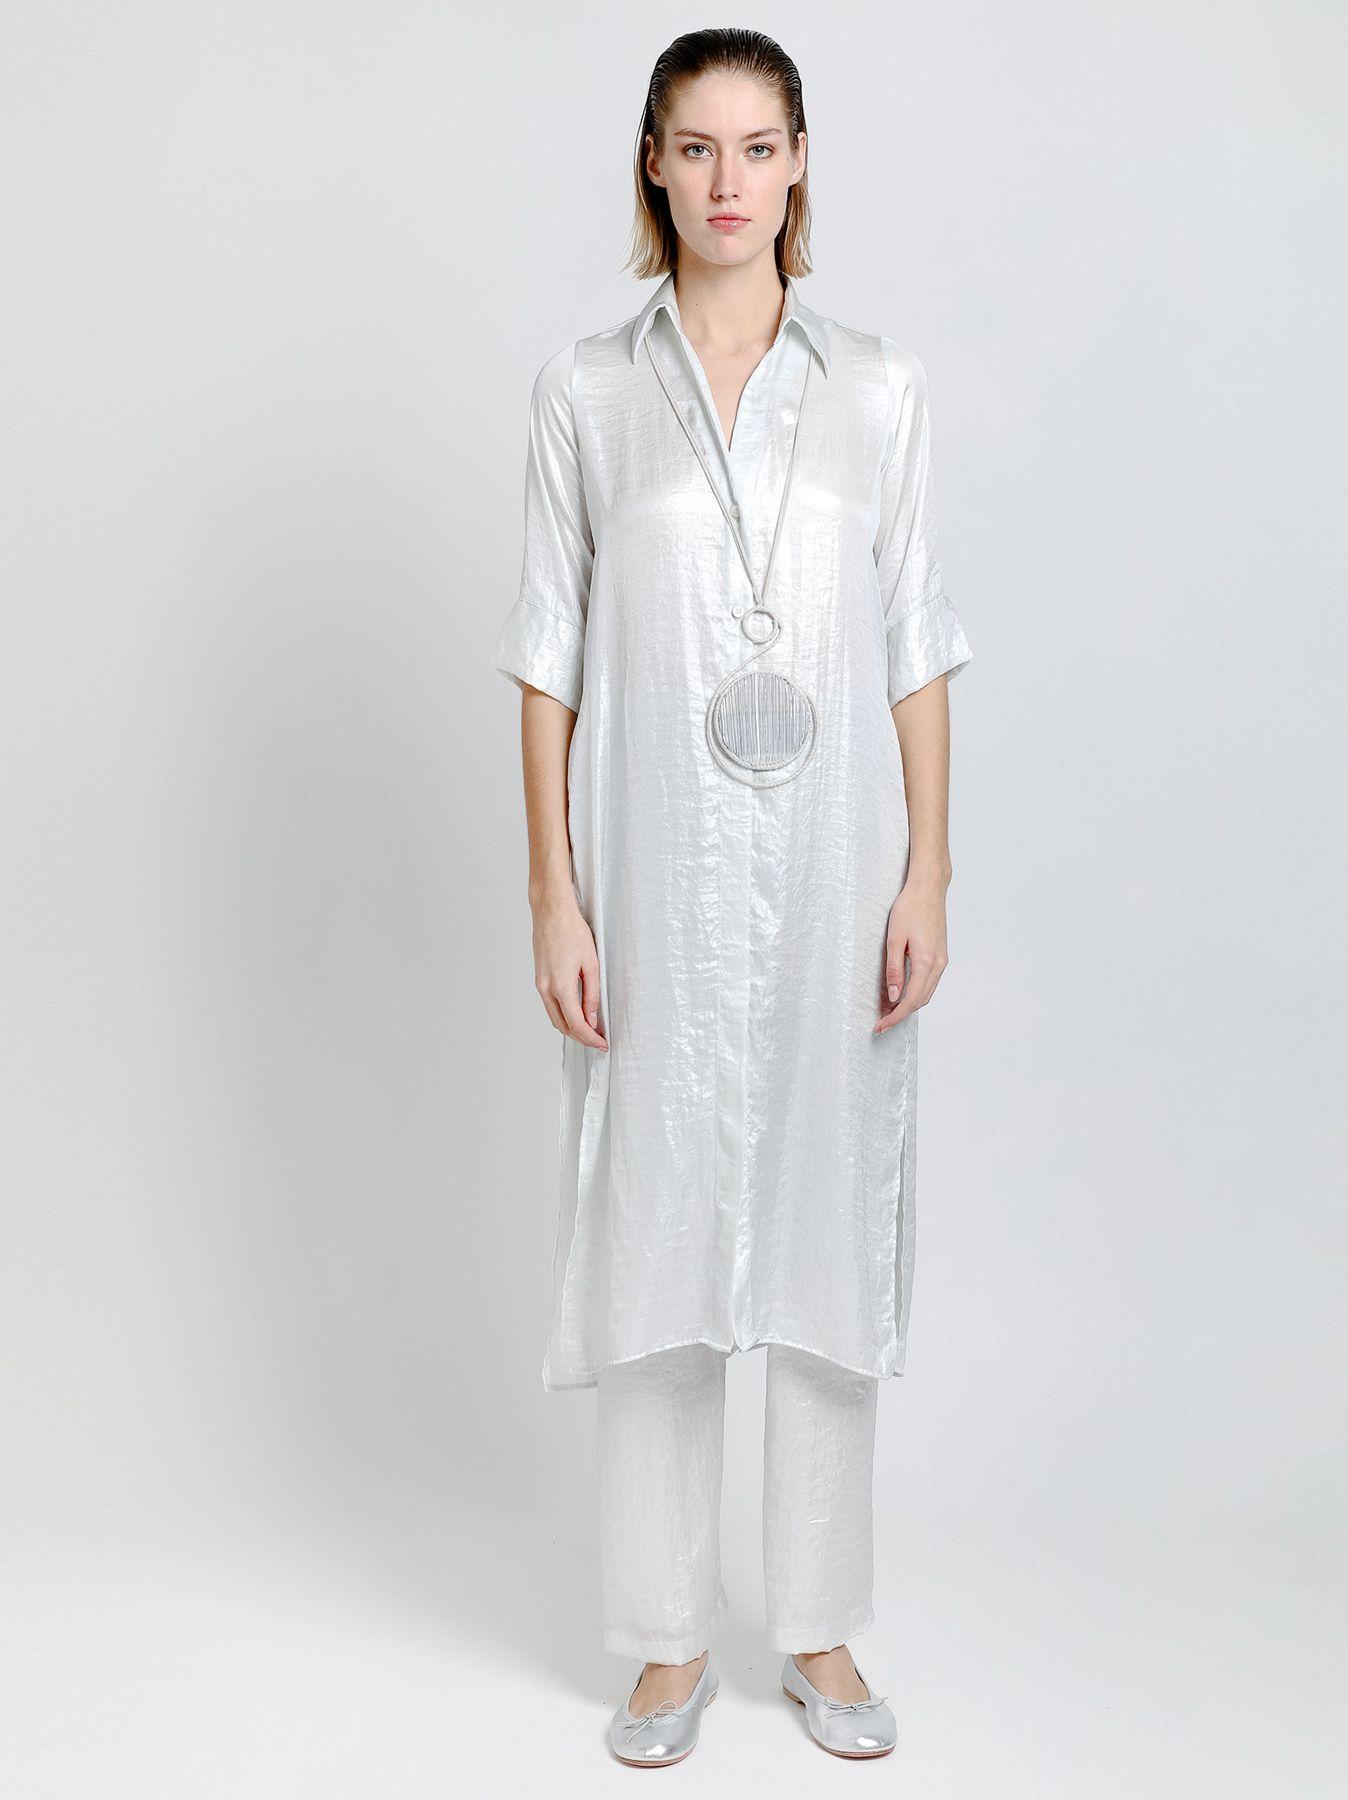 Camicia lunga kaftano